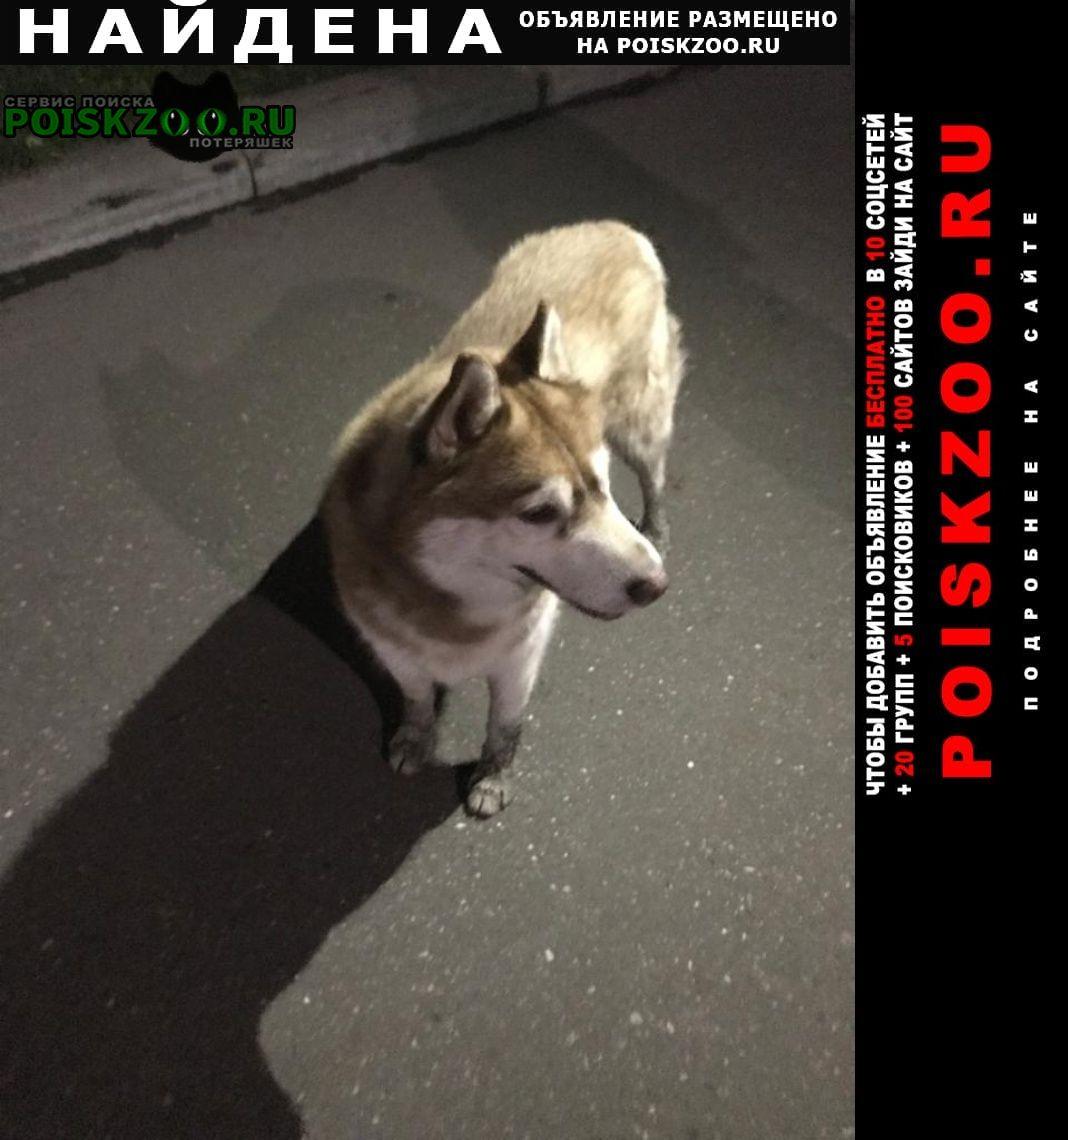 Найдена собака рыжий хаски Балашиха